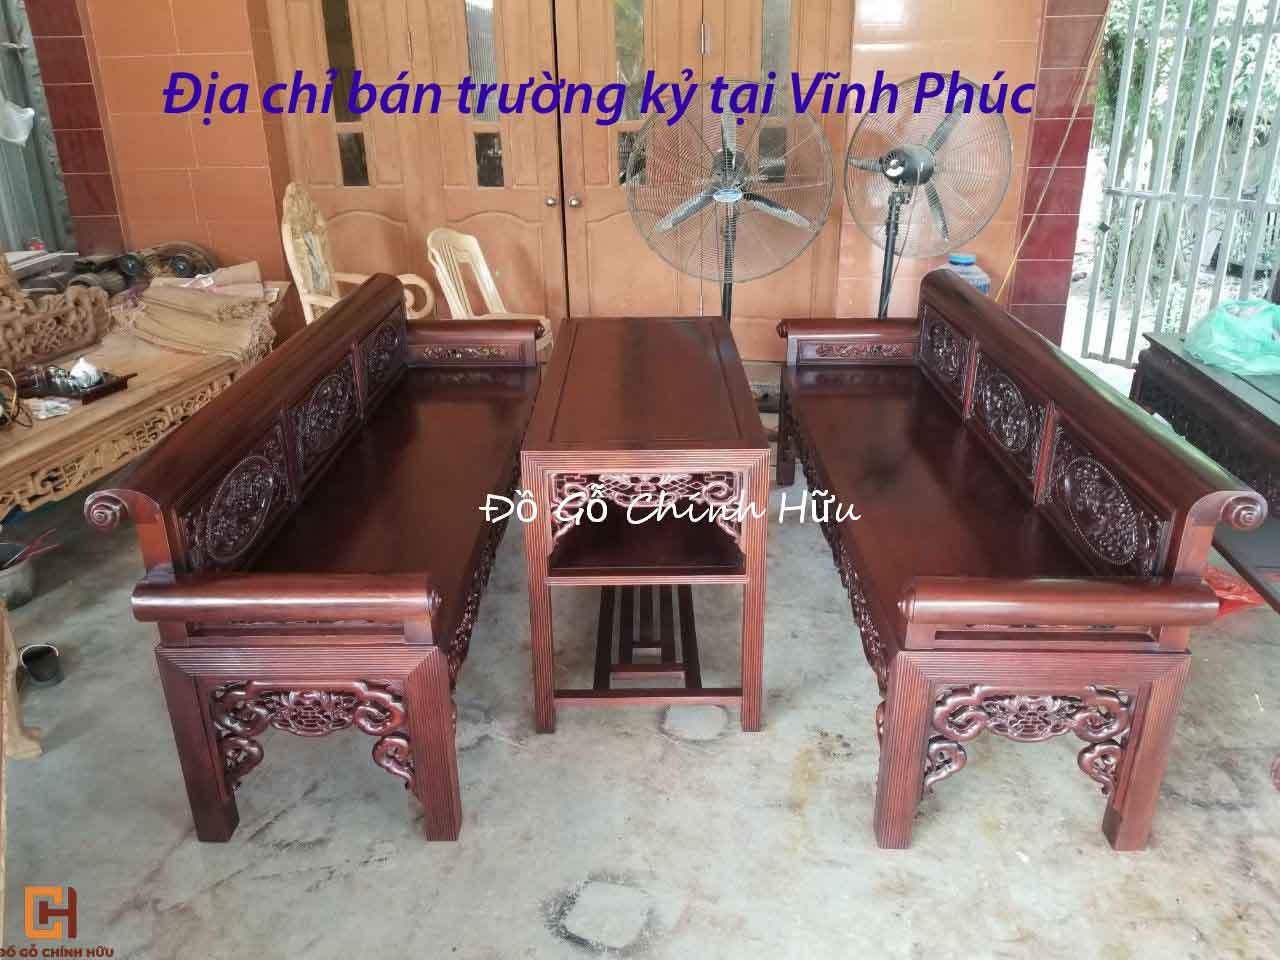 truong-ky-tai-vinh-phuc